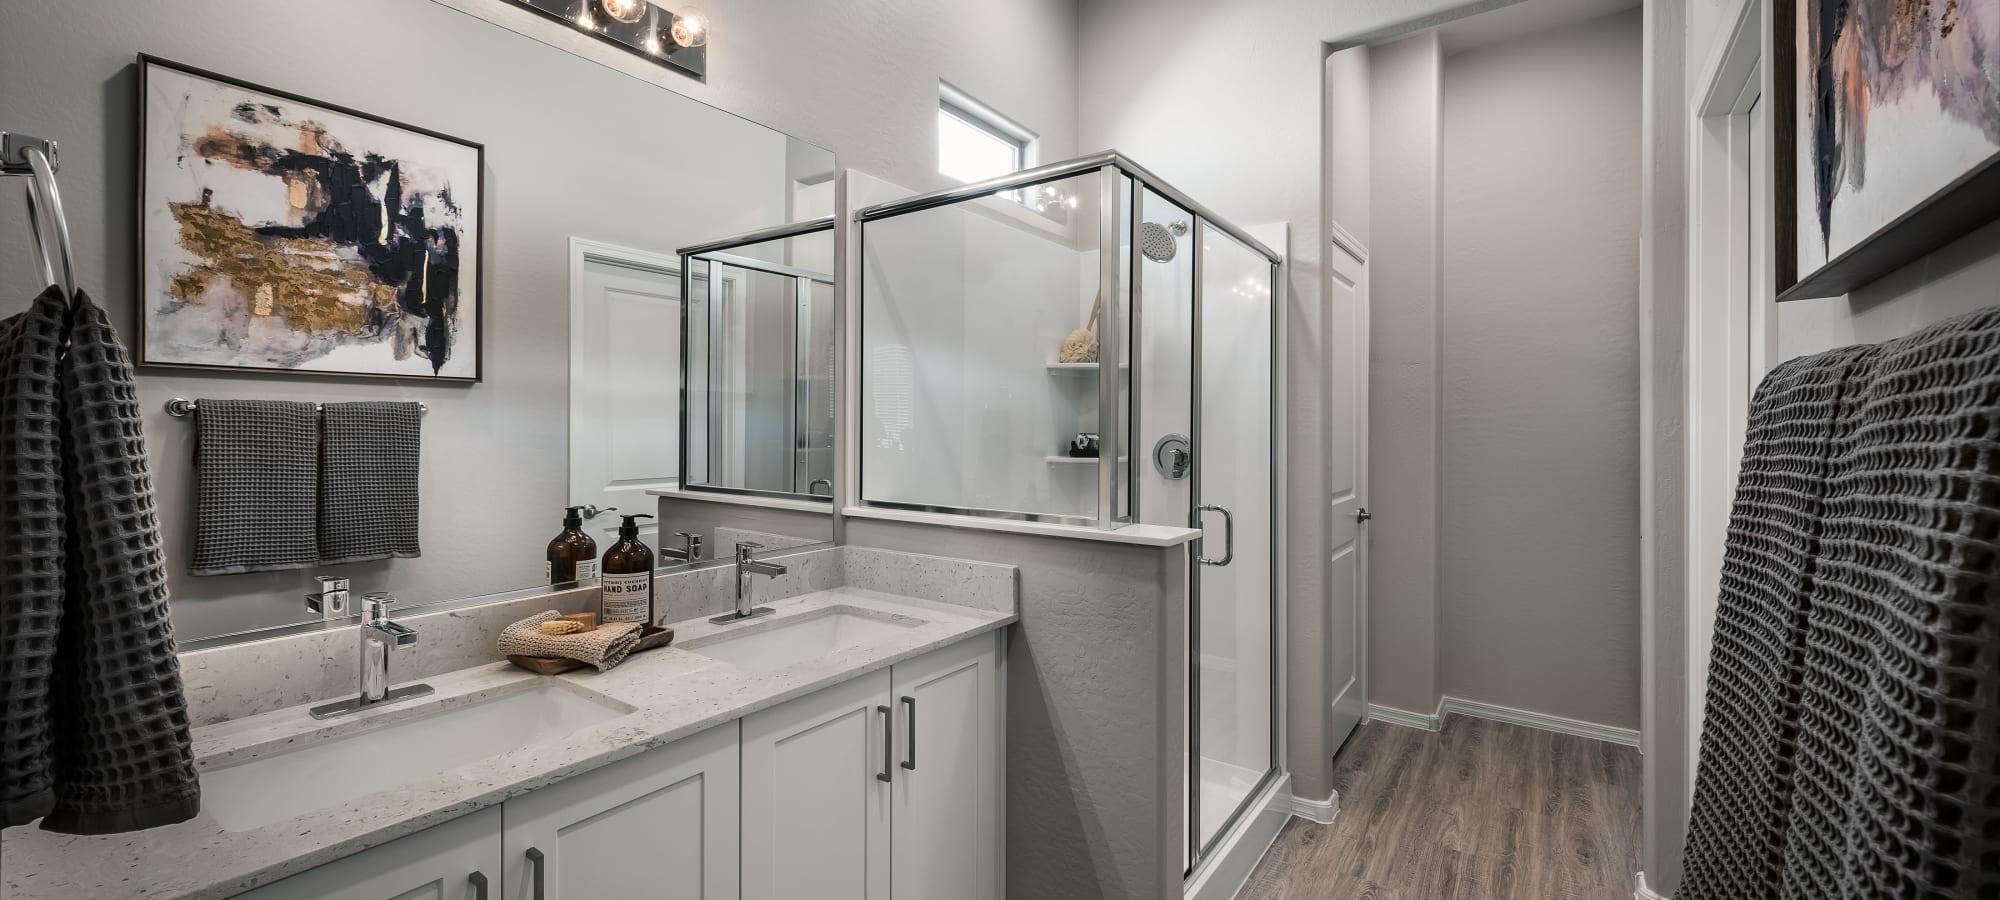 Inviting bathroom at TerraLane at Canyon Trails in Goodyear, Arizona